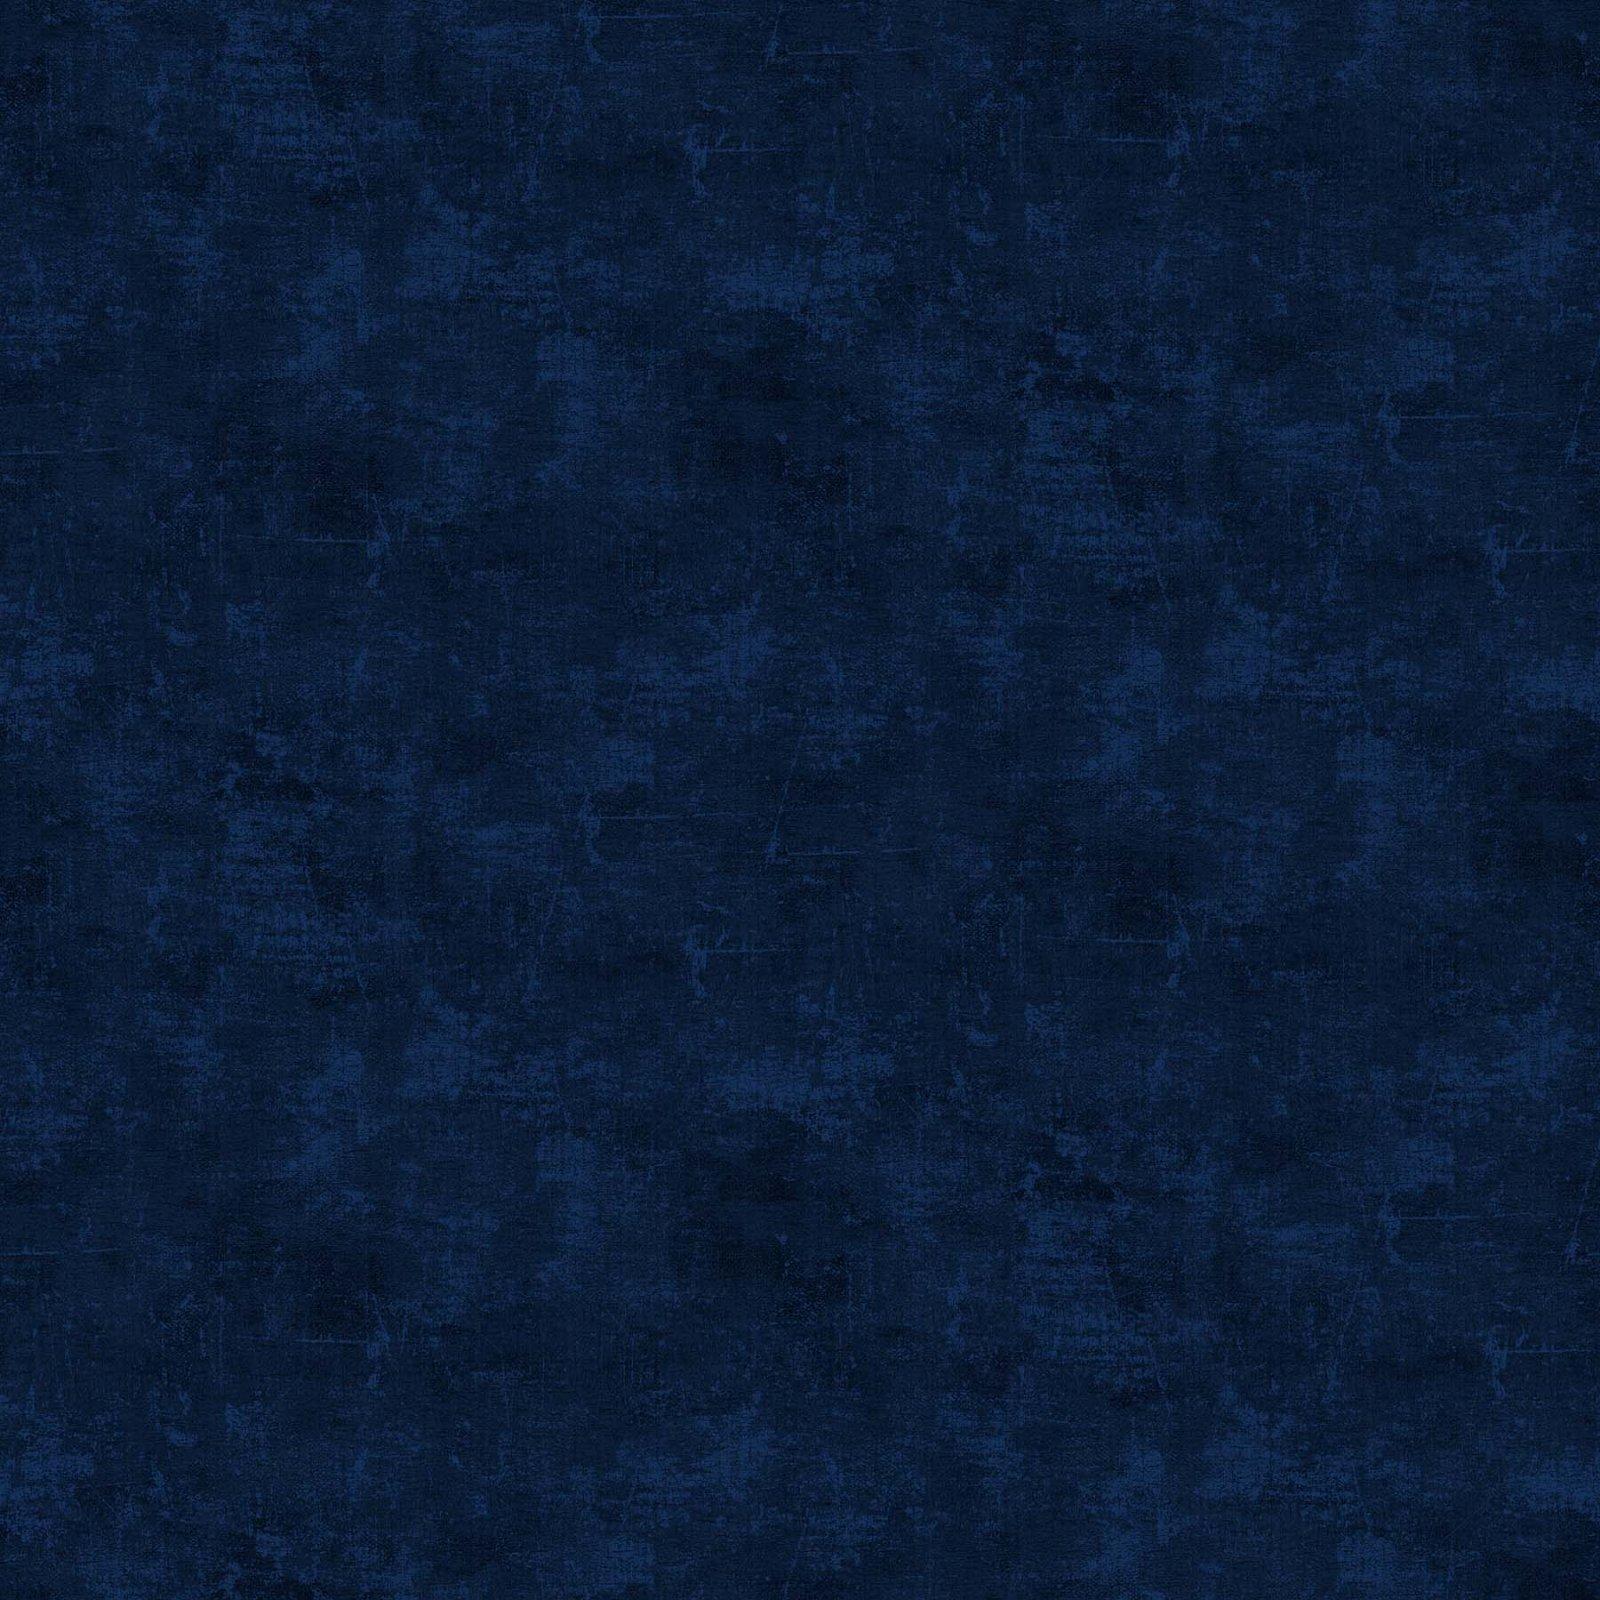 Canvas 9030-490 by Northcott Fabrics